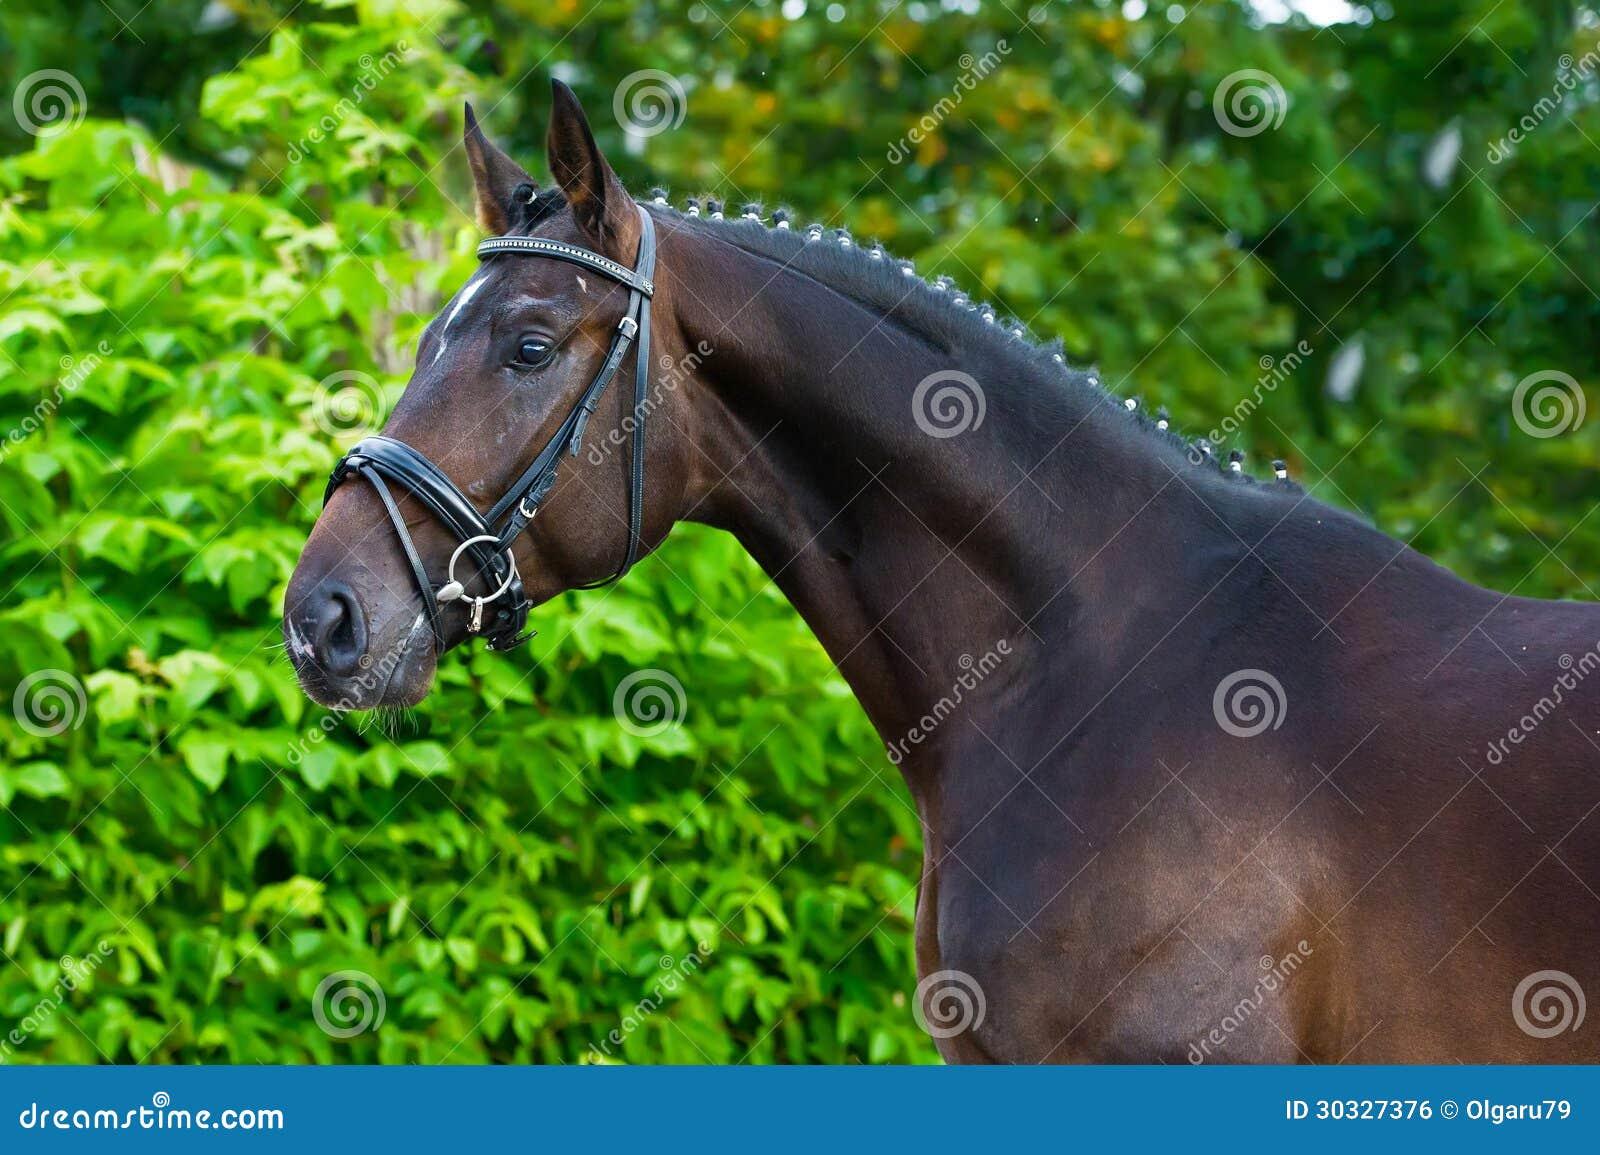 Horse breeder business plan bundle